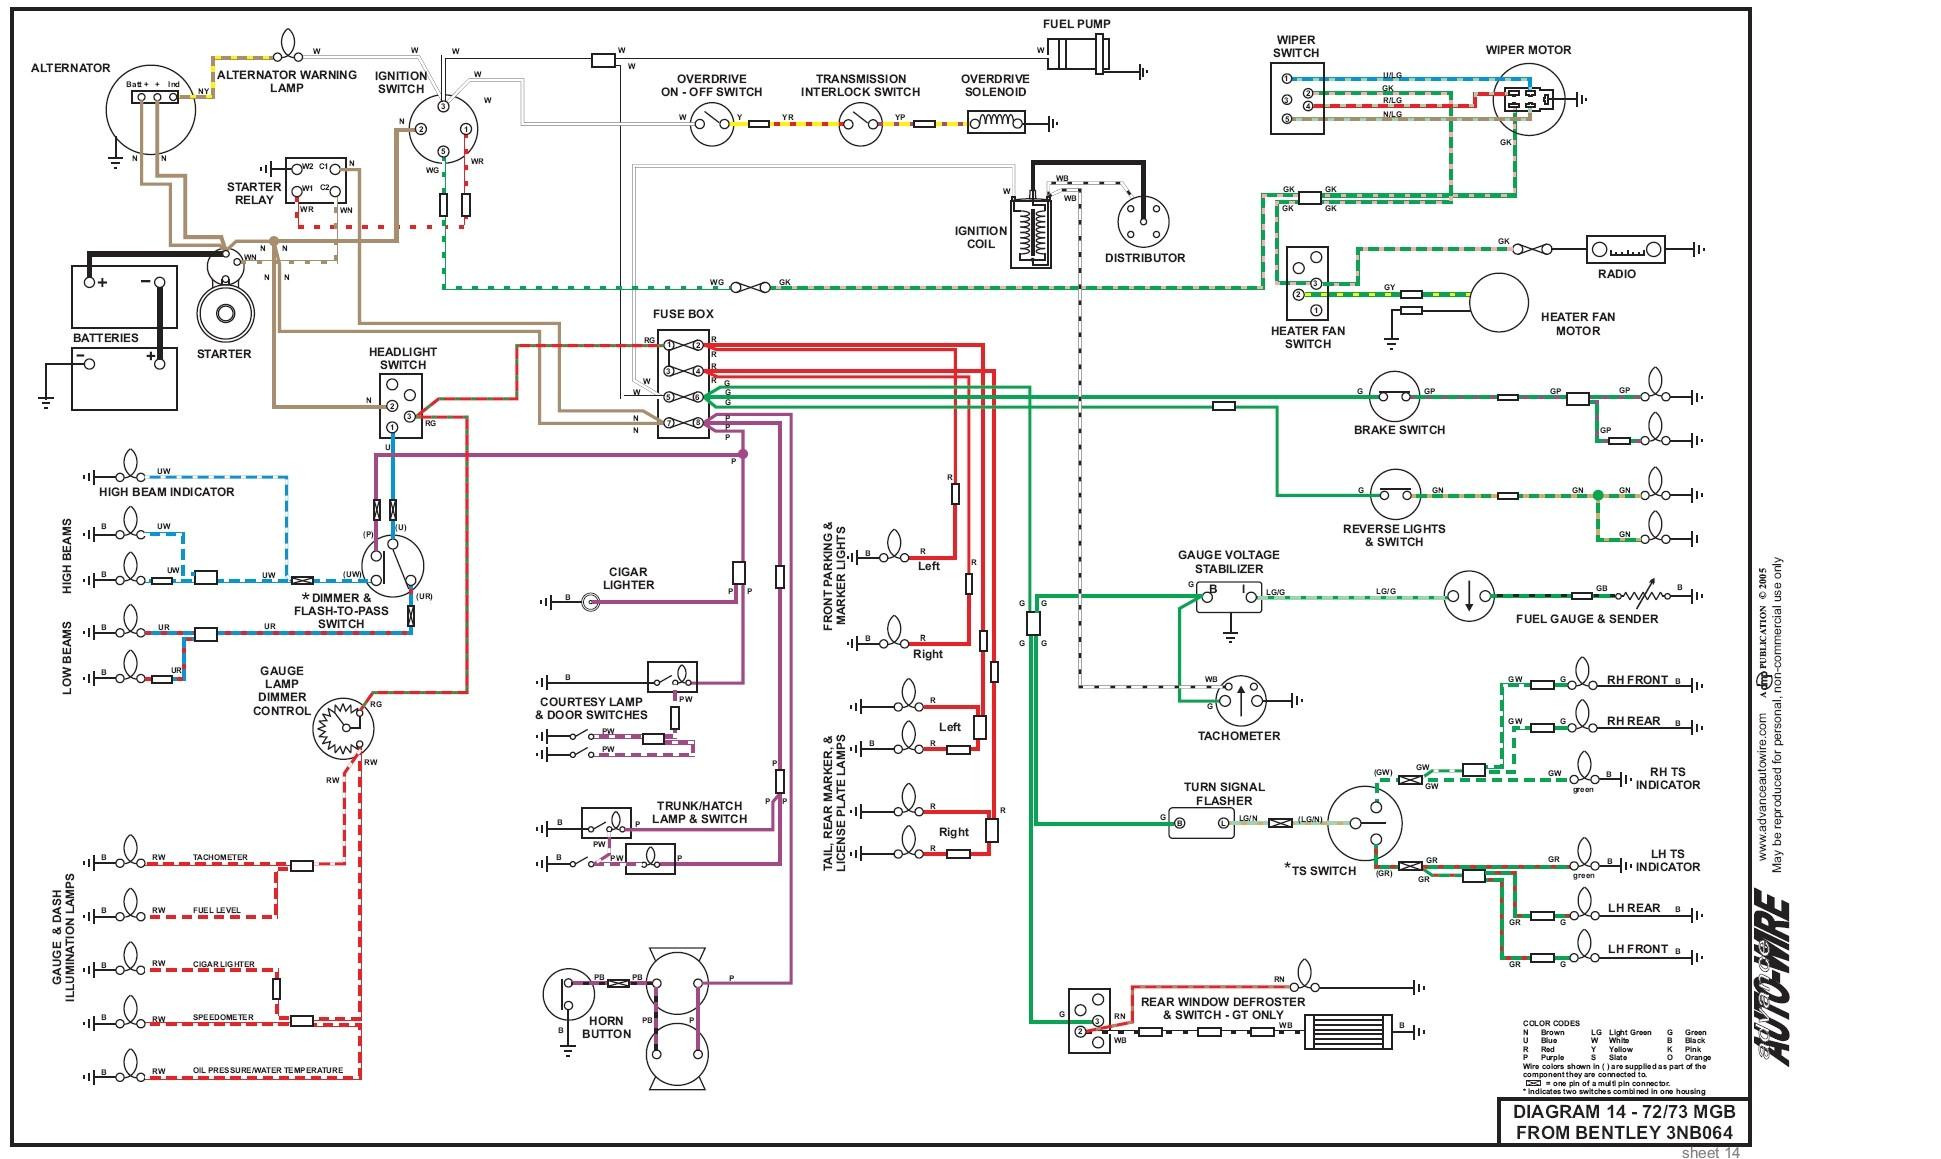 mg wiring diagram awesome 1976 mgb wiring diagram od wiring diagram library e280a2 of mg wiring diagram jpg